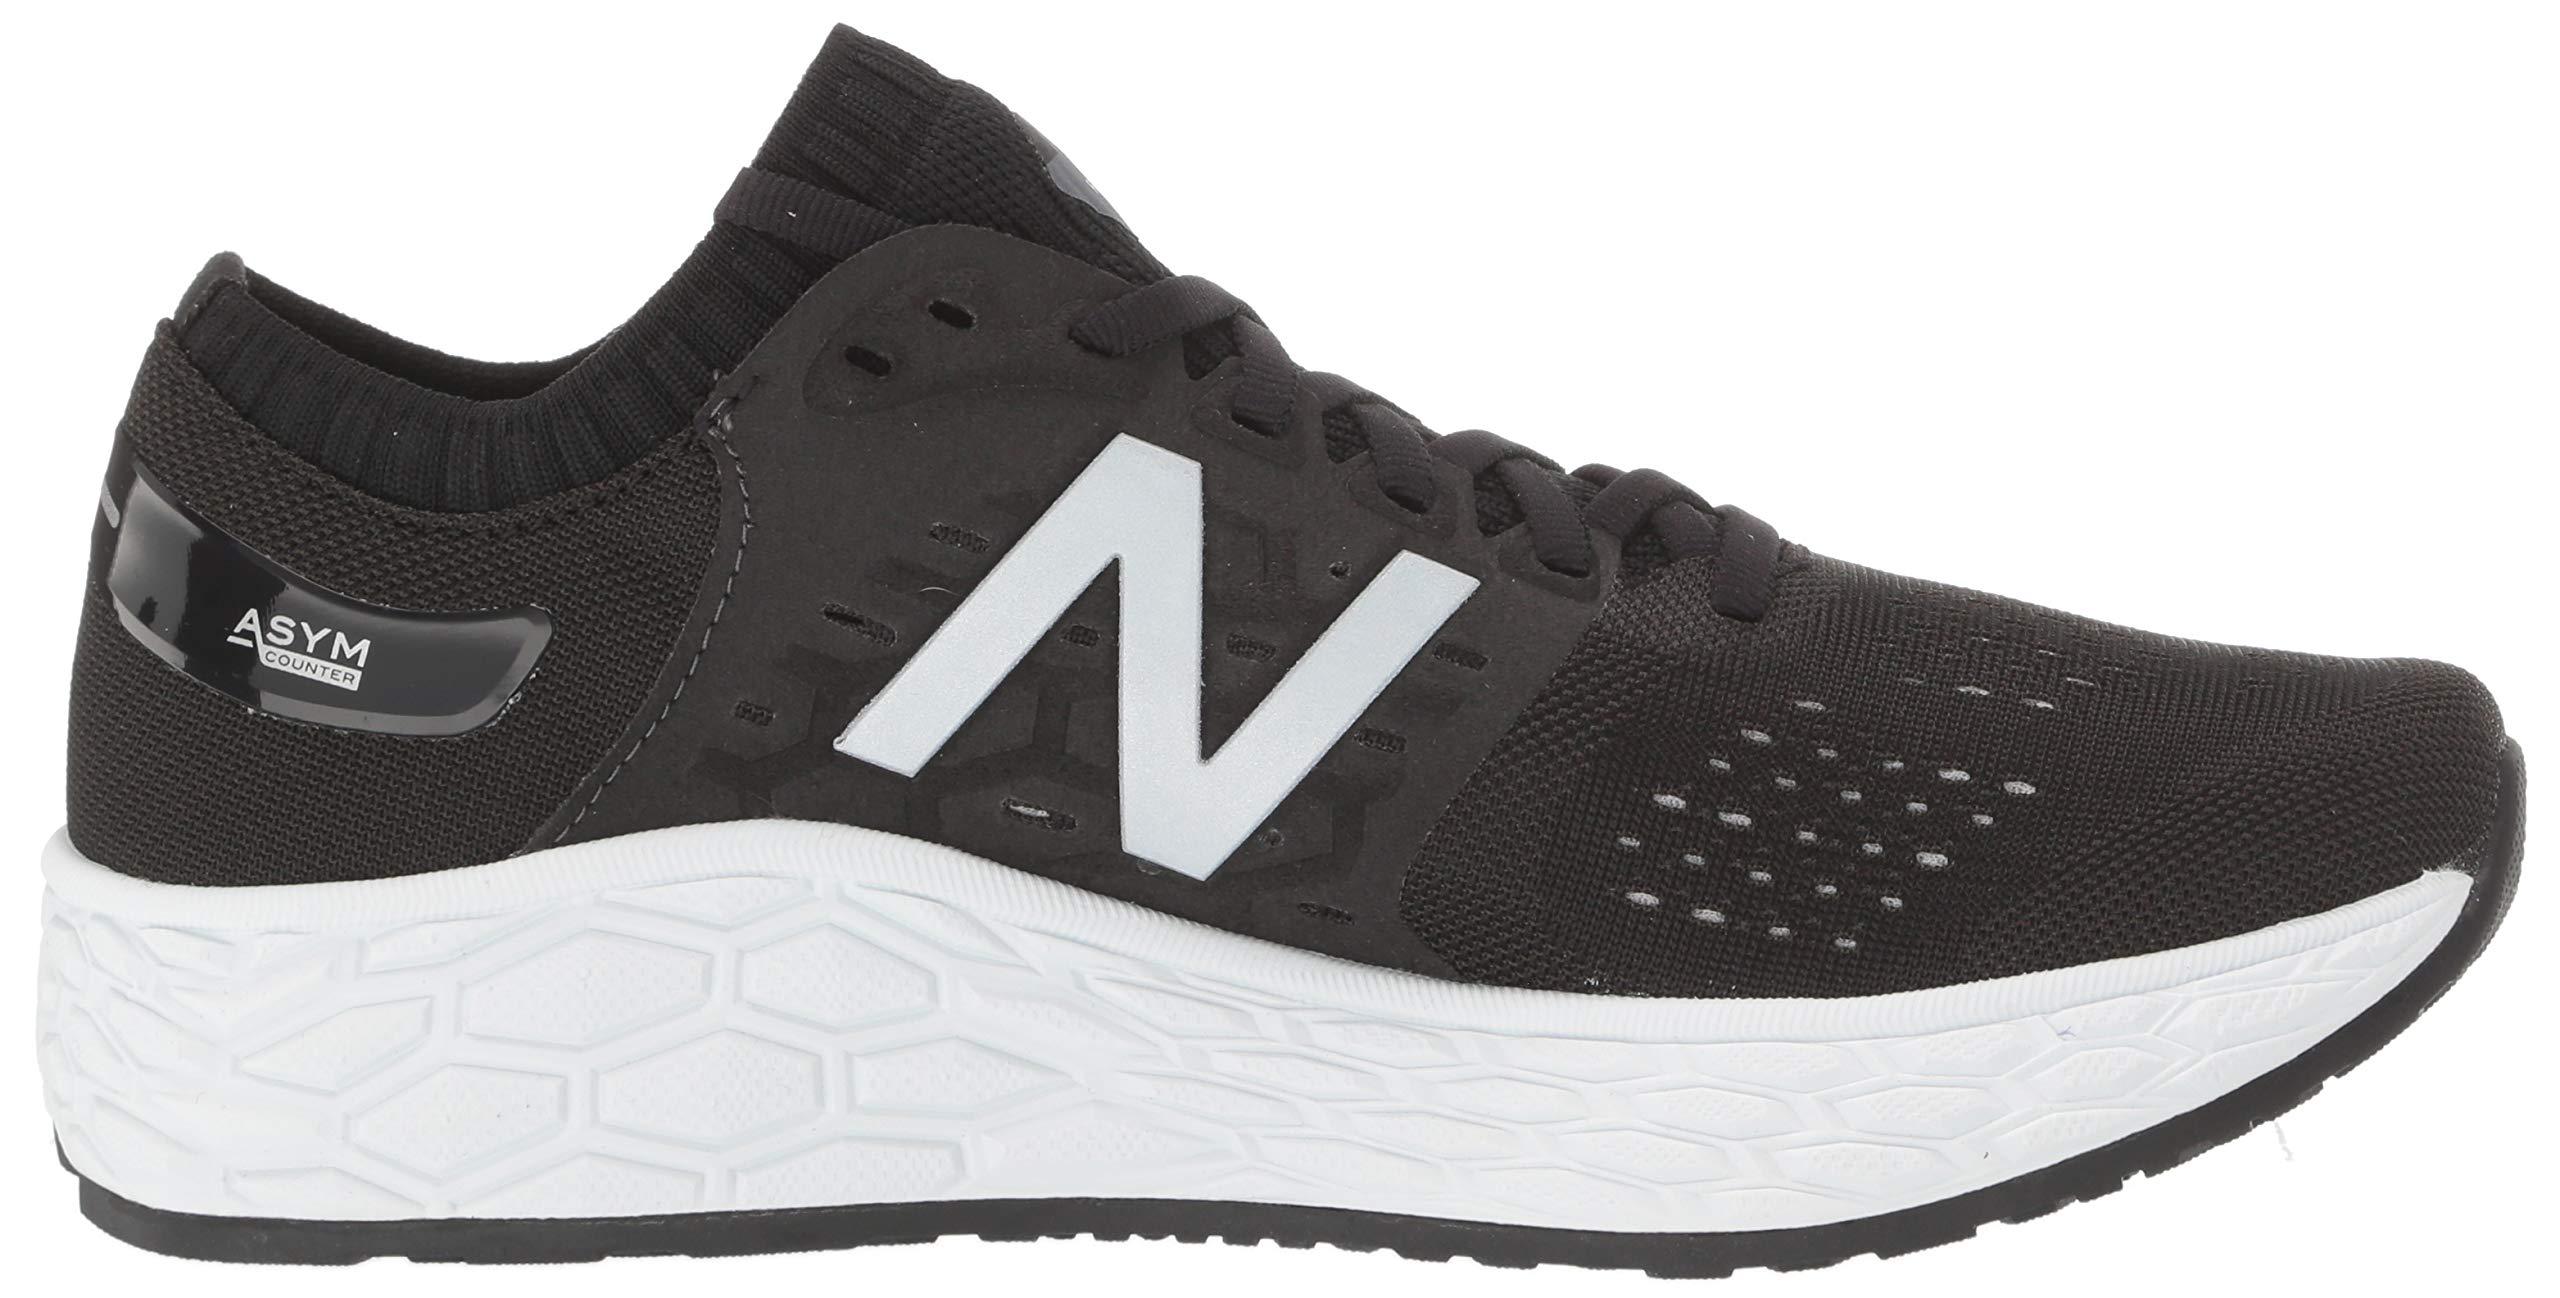 New Balance Women's Fresh Foam Vongo Running Shoes, AD Template Size